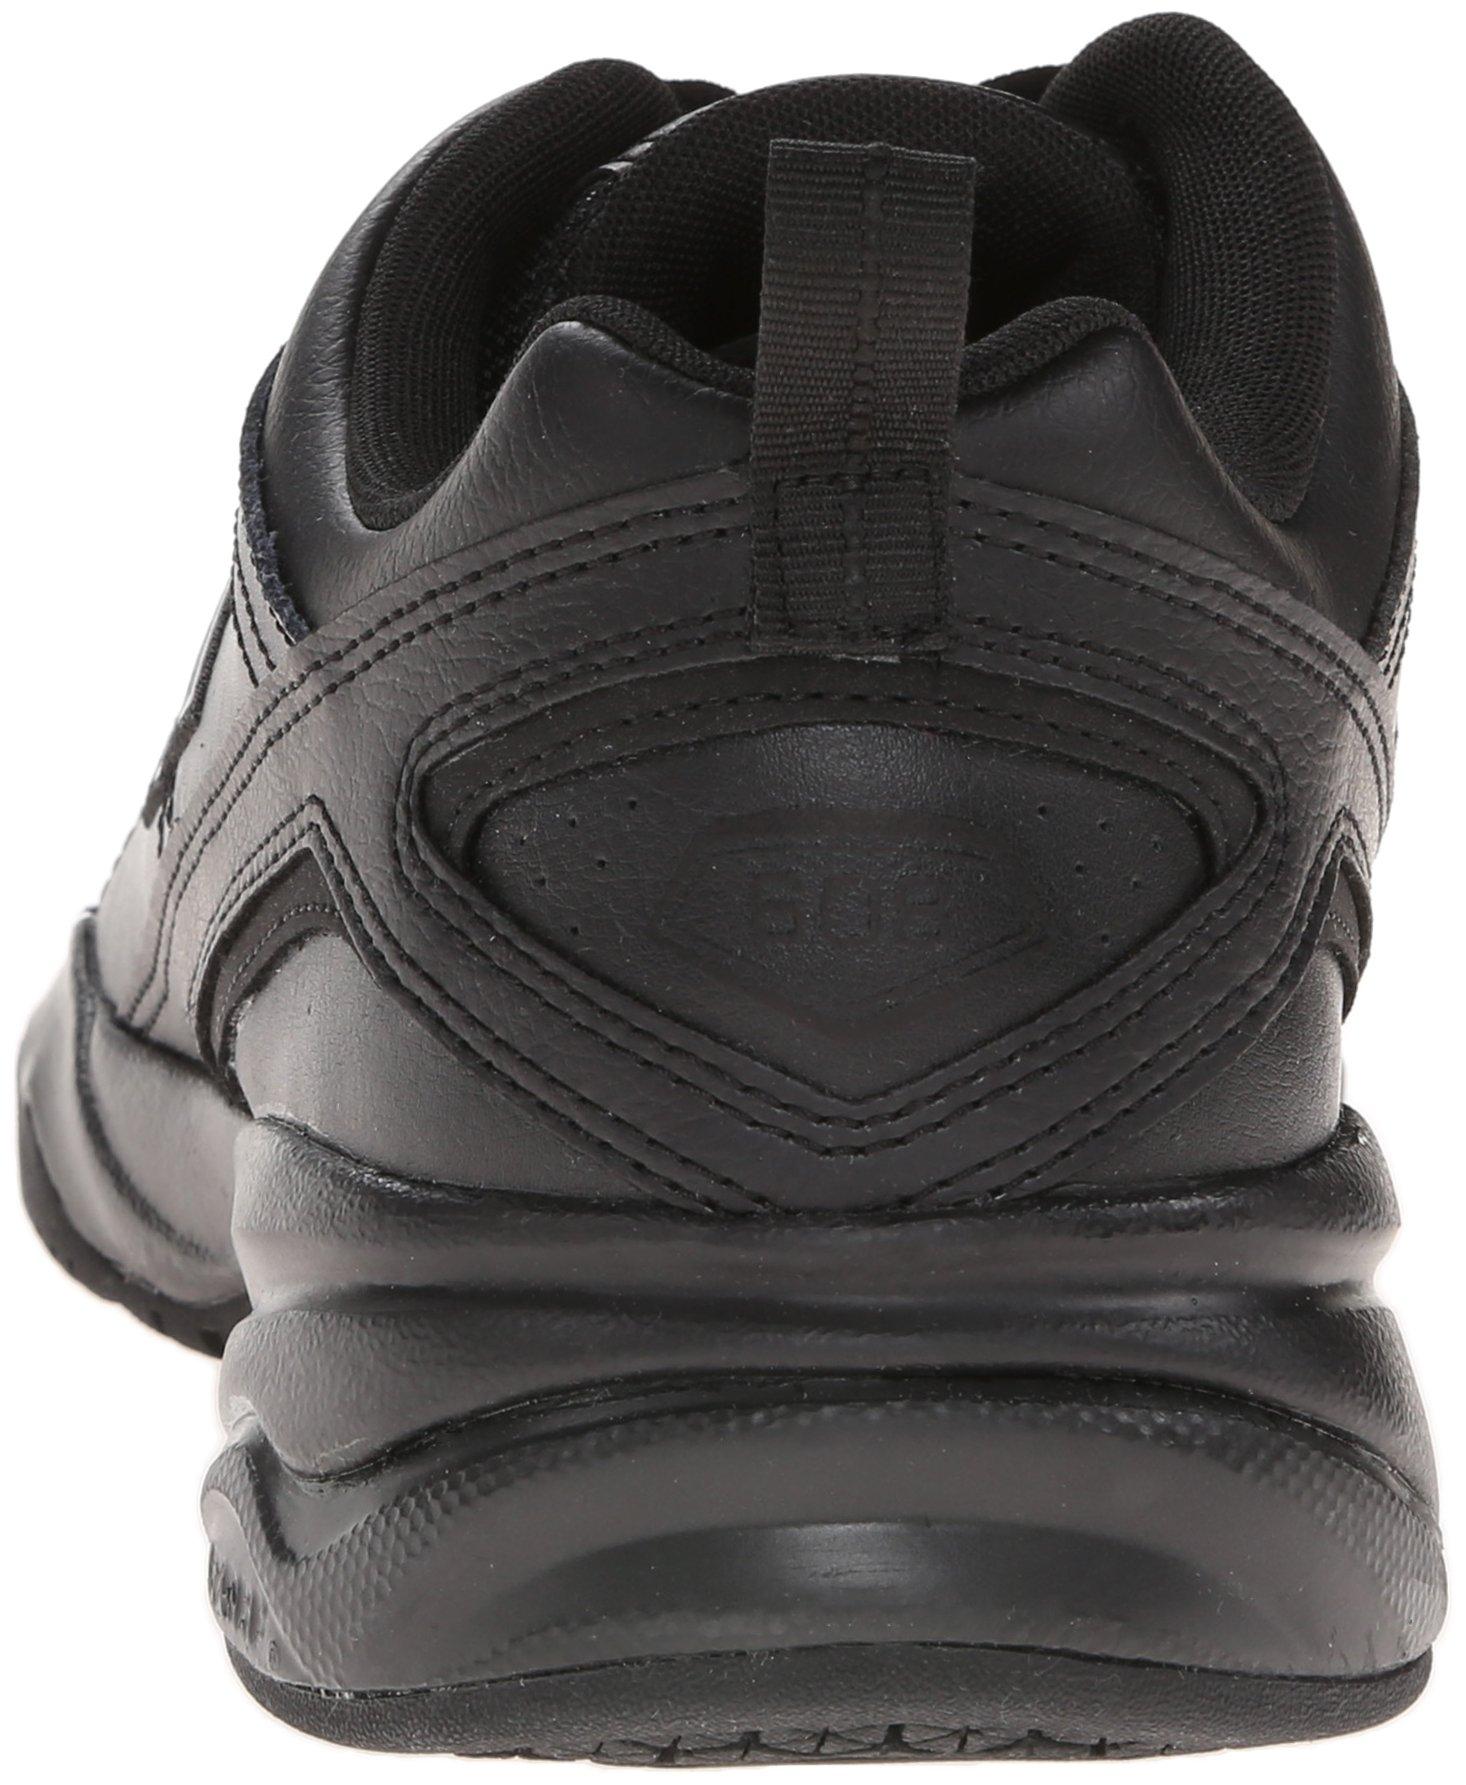 New Balance Men's MX608v4 Training Shoe, Black, 6.5 D US by New Balance (Image #2)